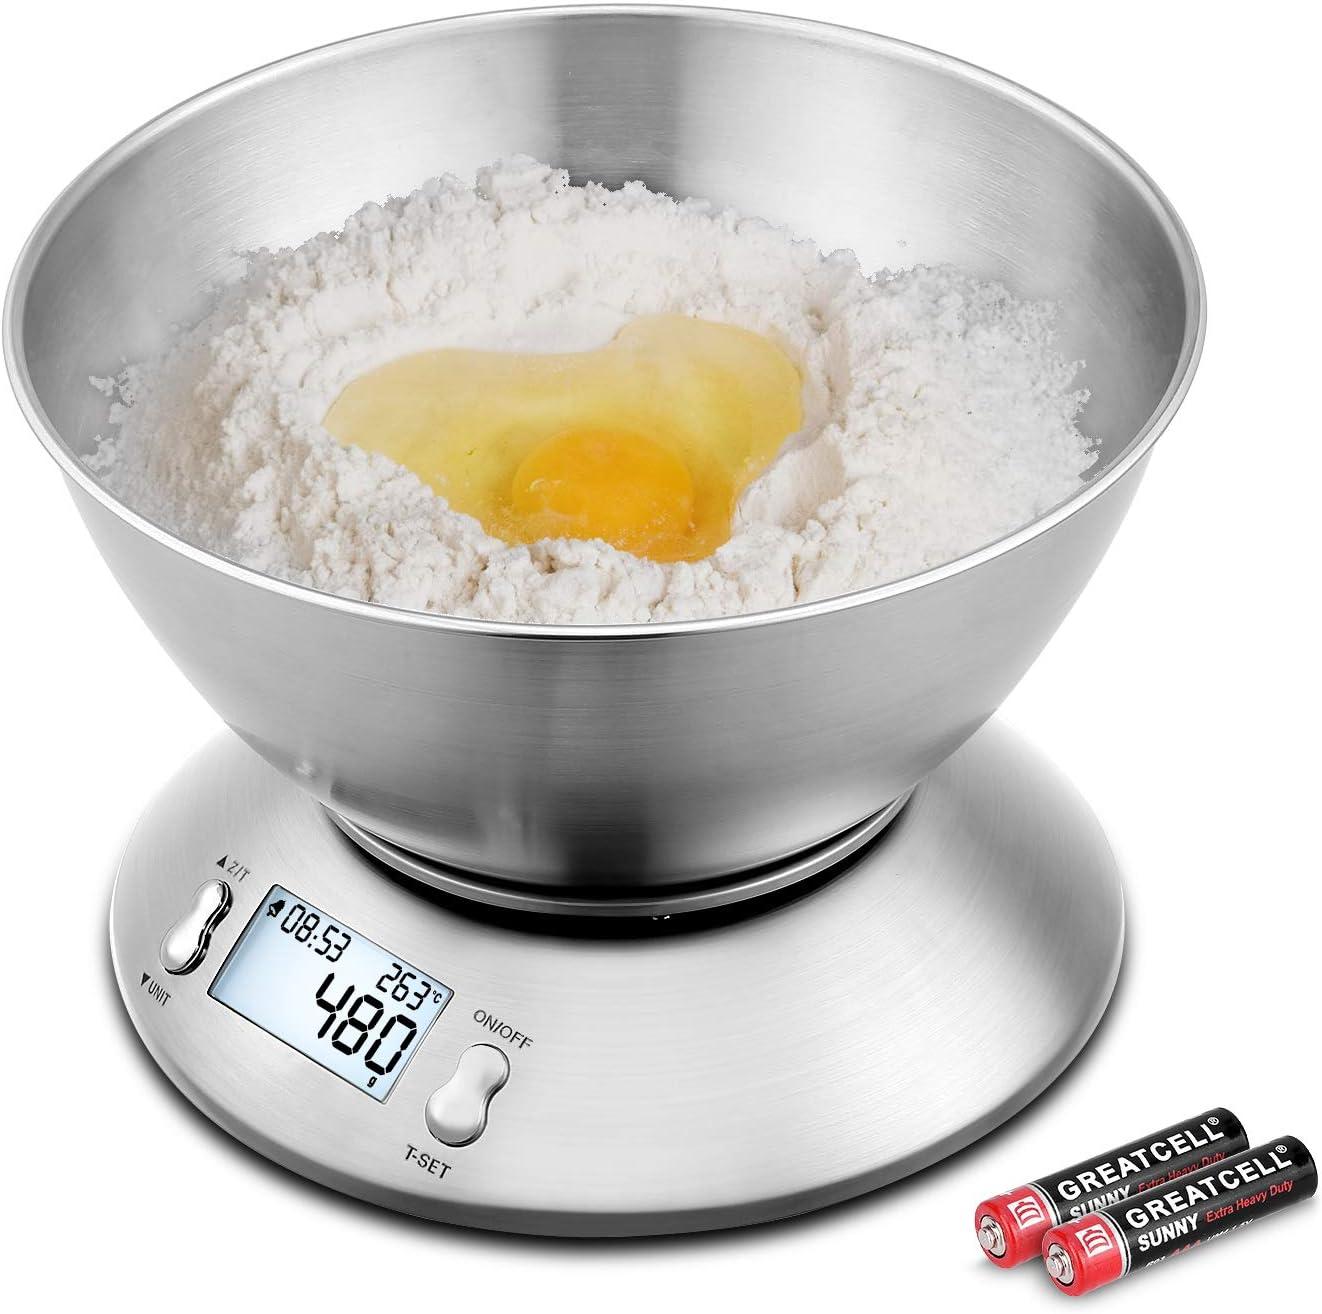 Uten Báscula de Cocina Electrónicas 5kg Balanzas para Alimentos Función de Tara con Pantalla LCD Apagado Automático con Cuenco Removible